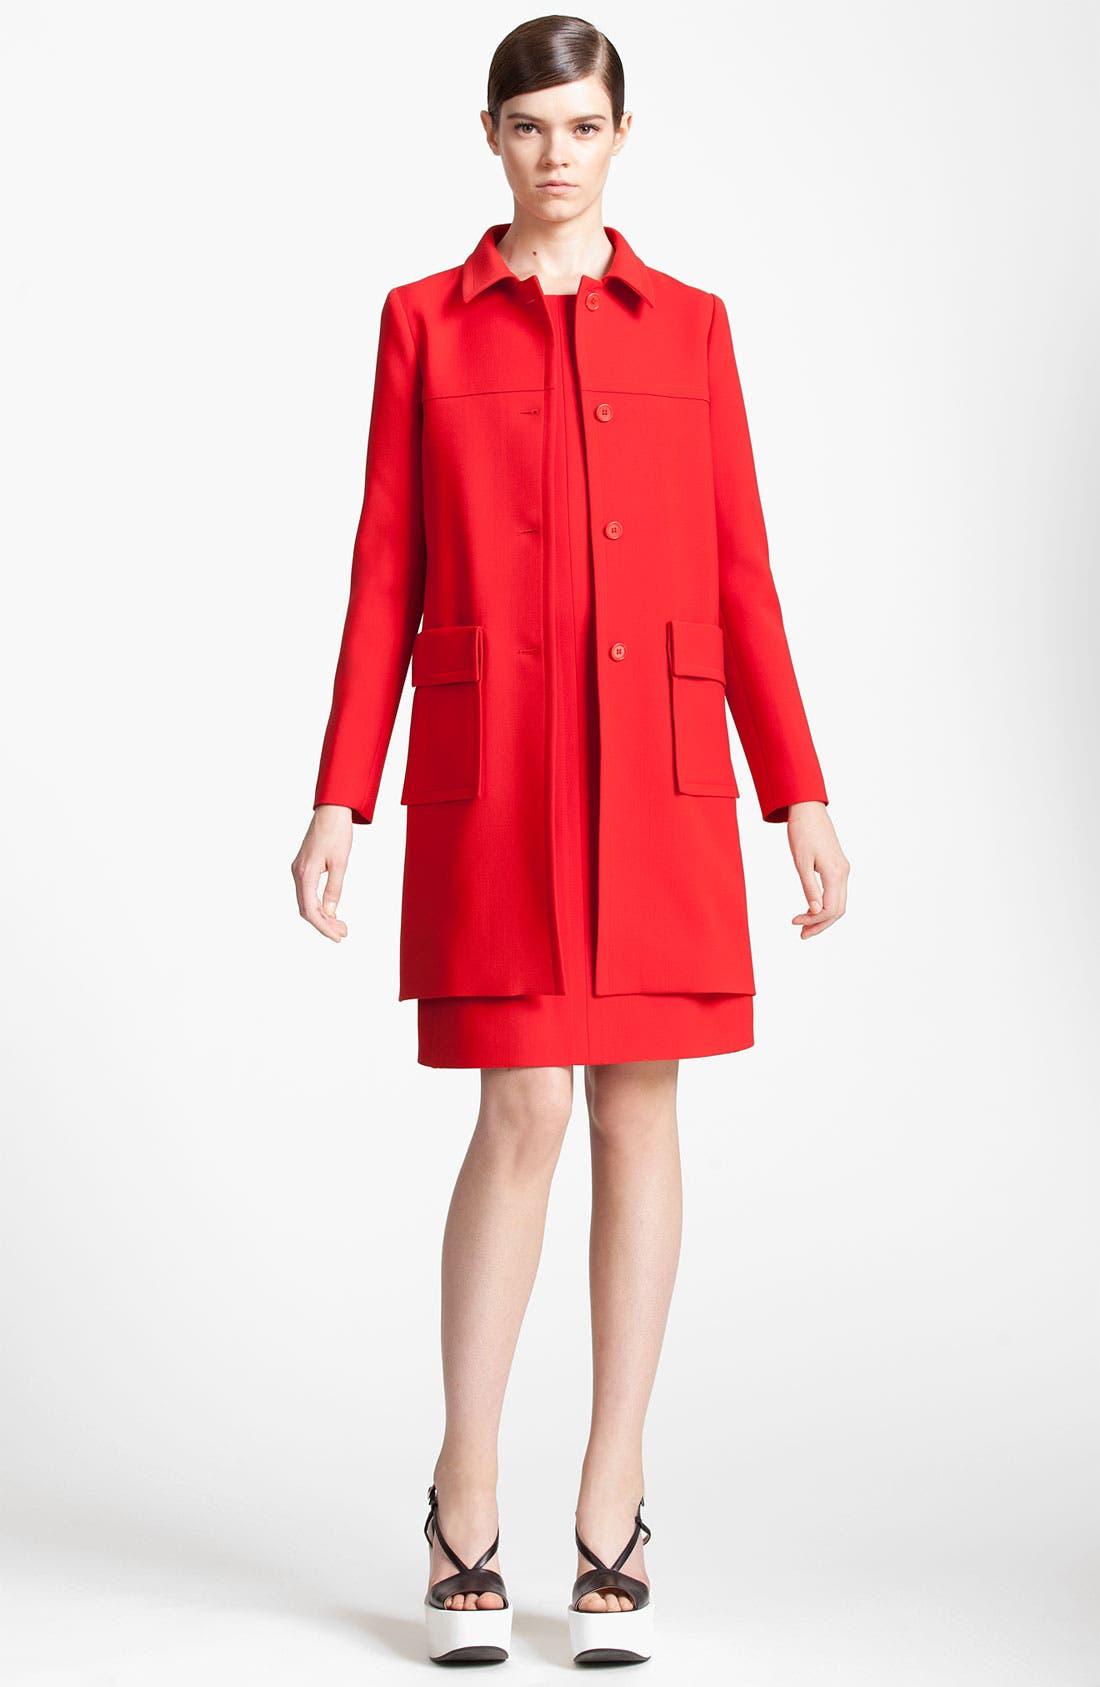 Main Image - Jil Sander Coat & Dress